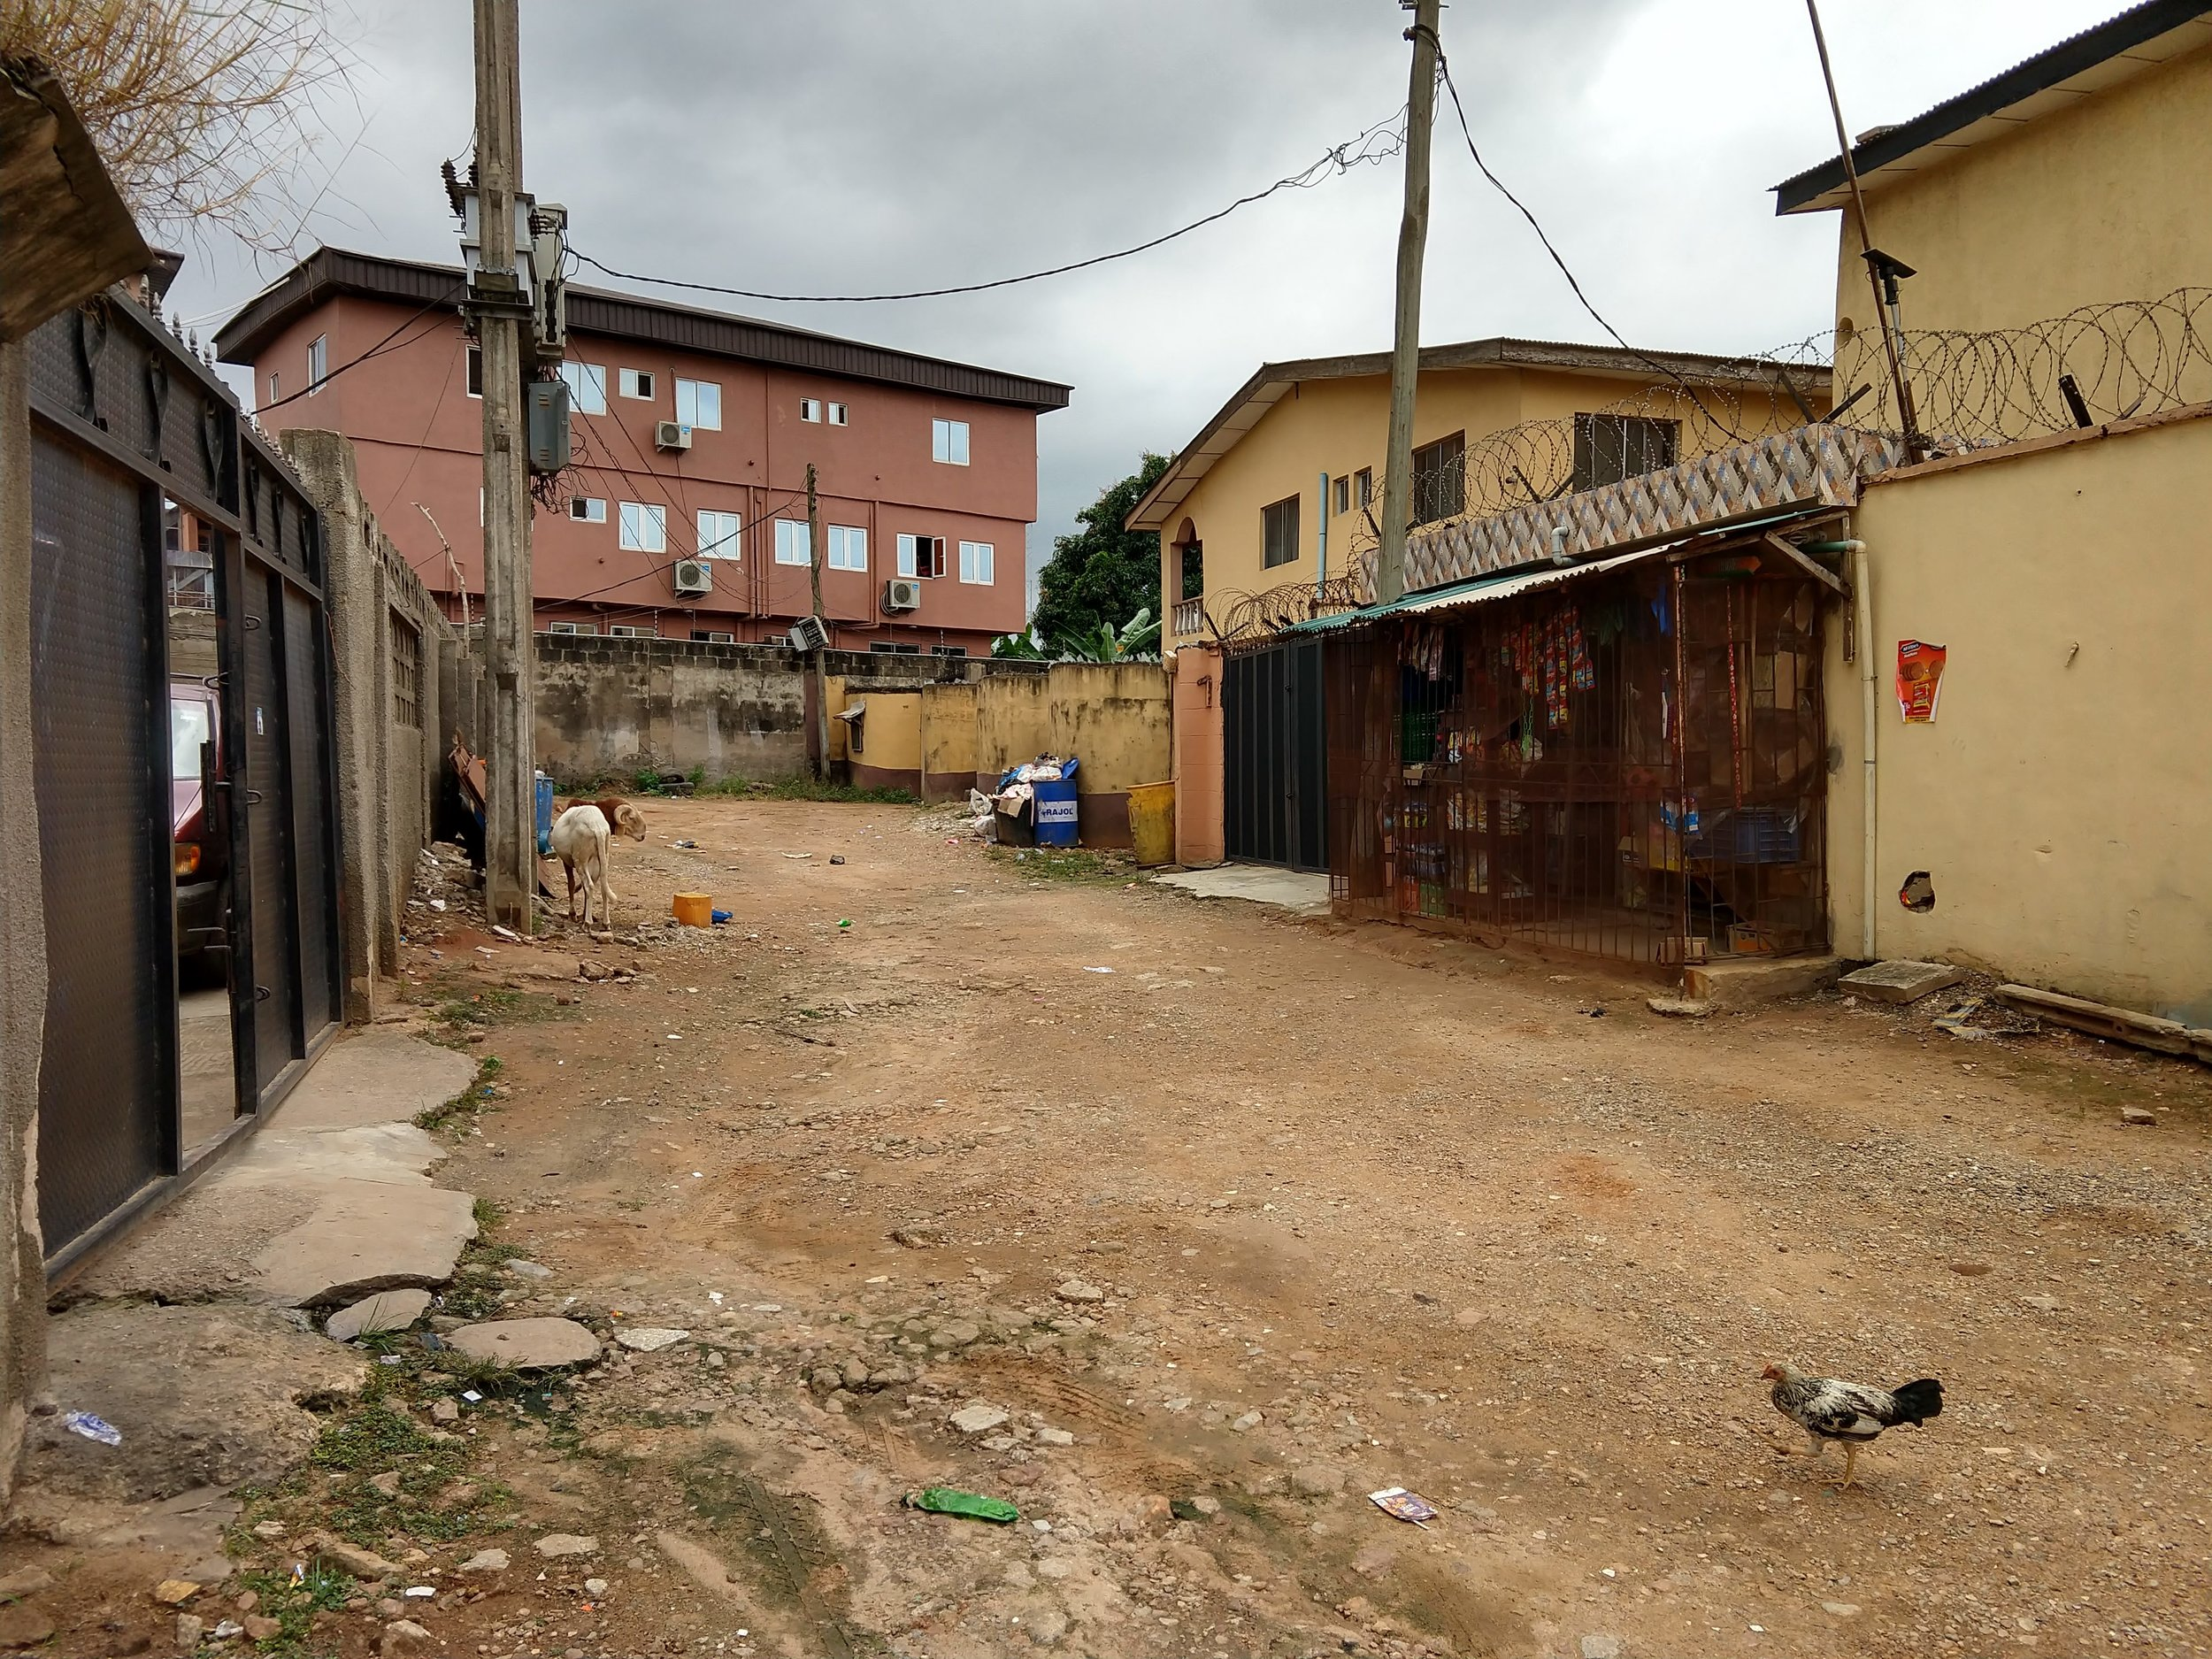 A chicken wanders a housing estate street in Lagos.